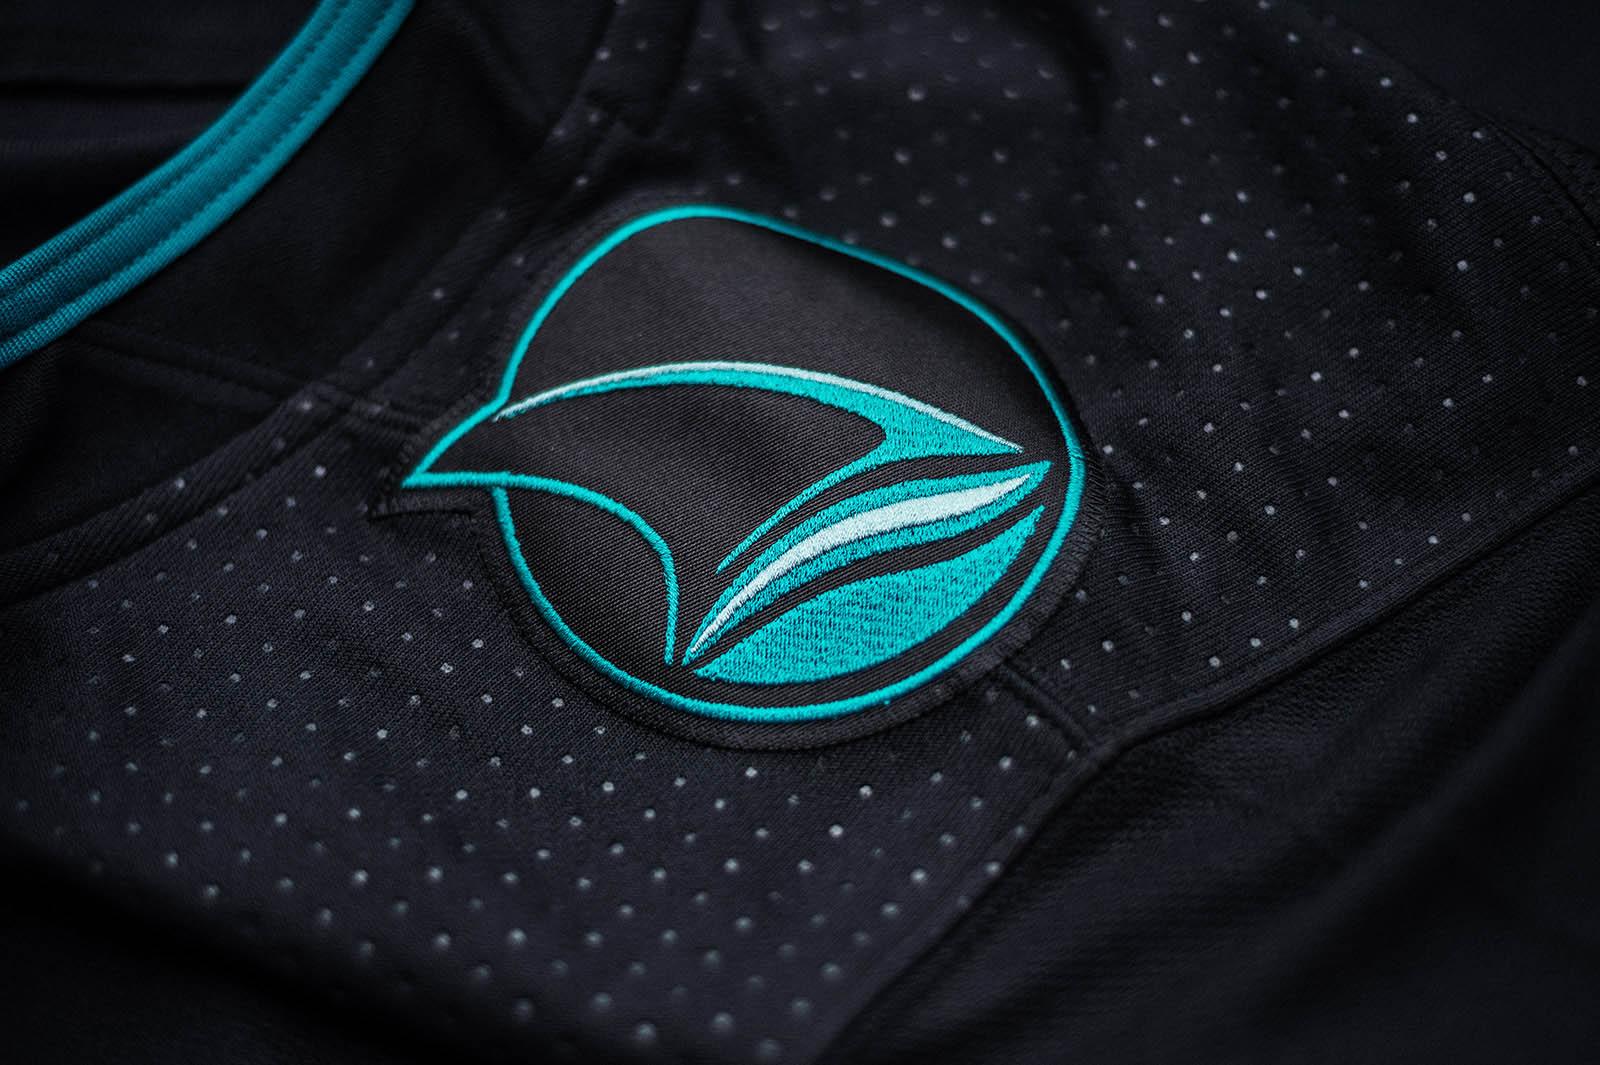 adidasHockey x Sharks 3rd Jersey_015.jpg